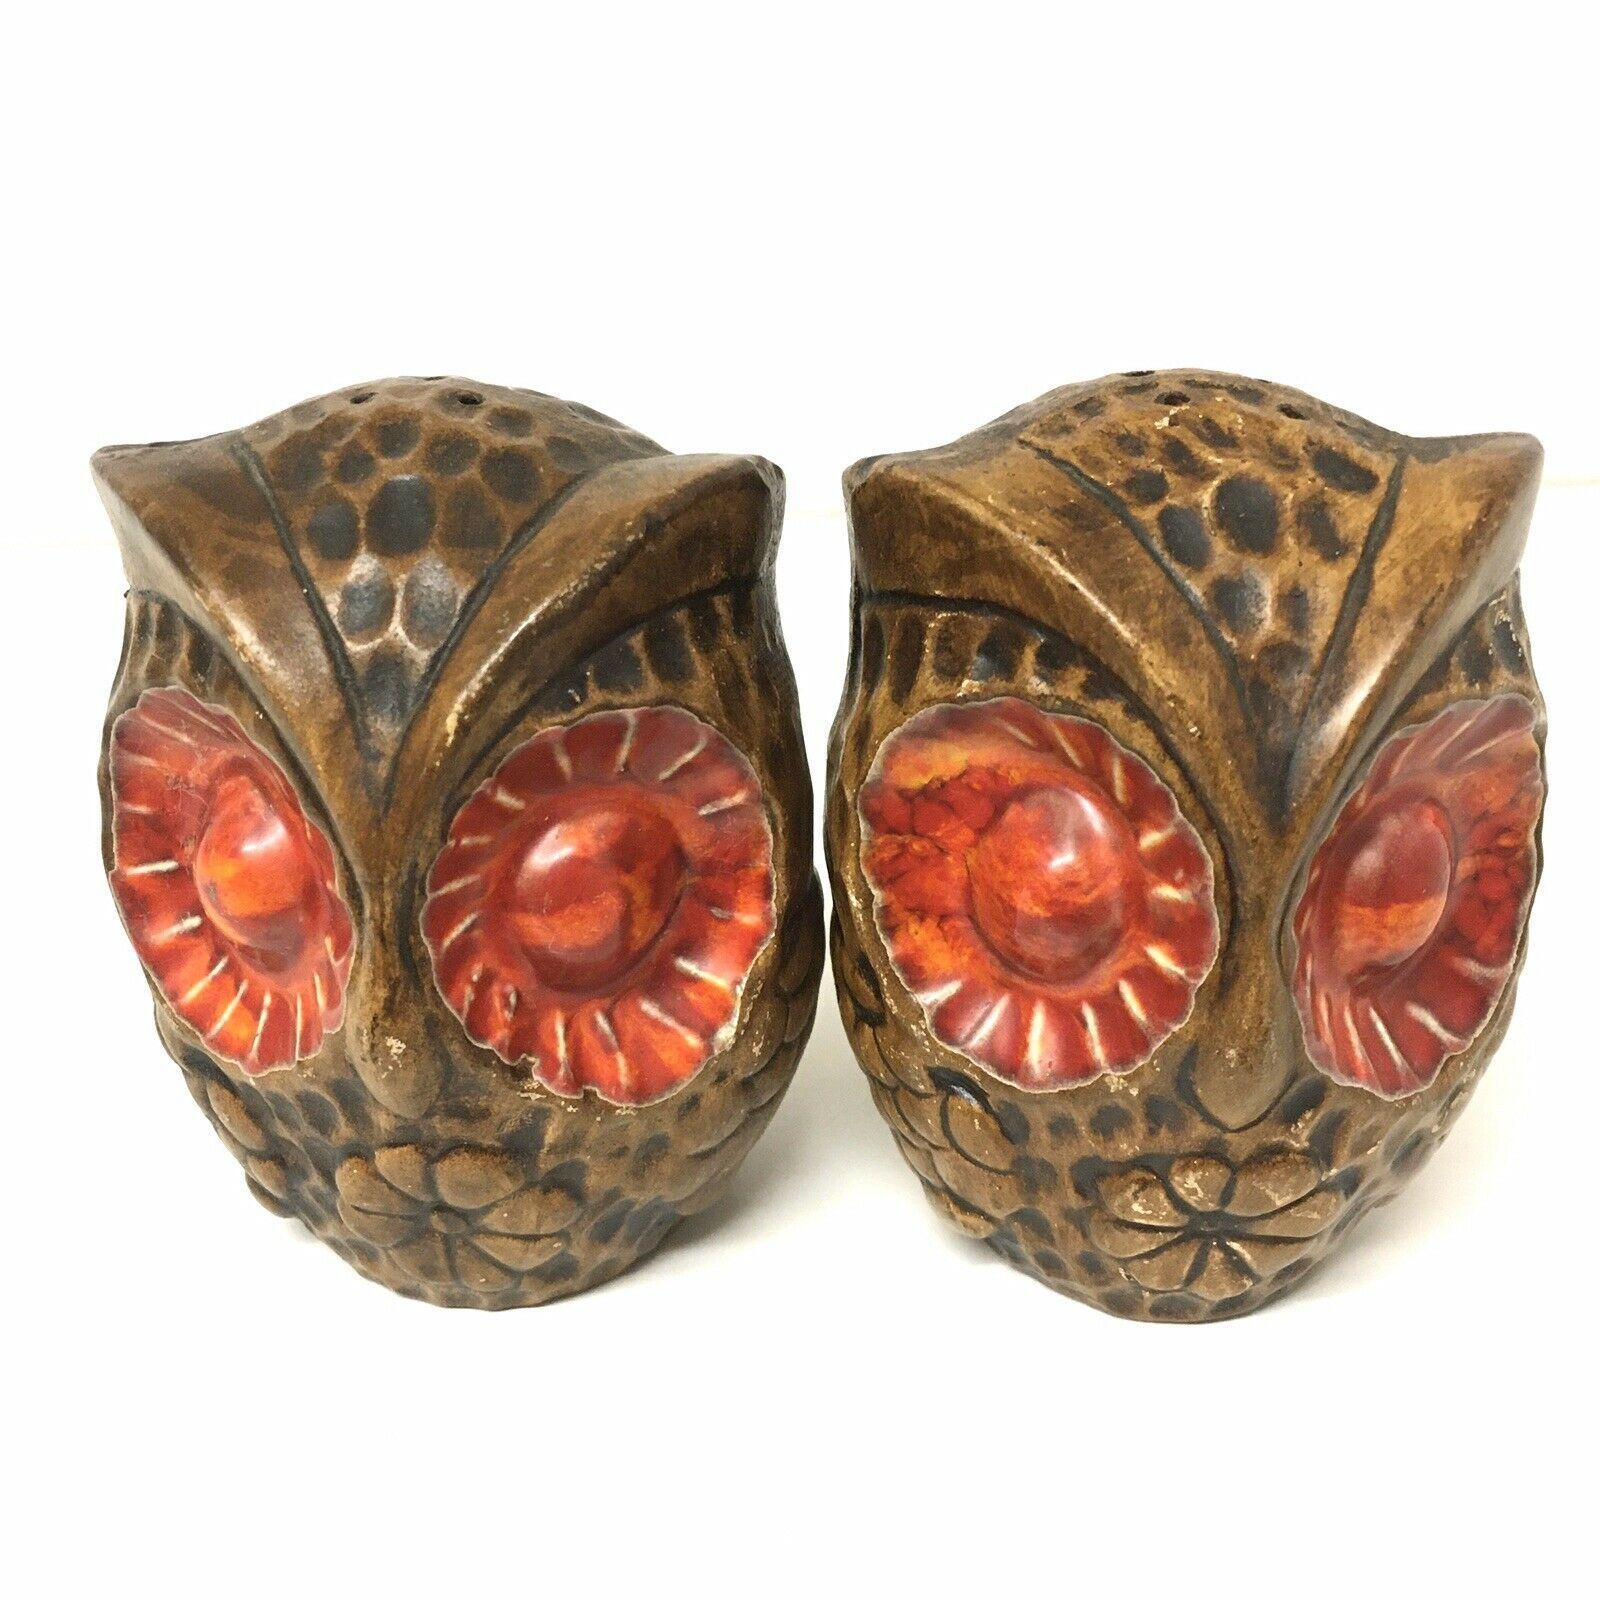 Treasure Craft Big Red Eyed Owl Salt Pepper Shakers MCM RETRO Mid Century - $19.79